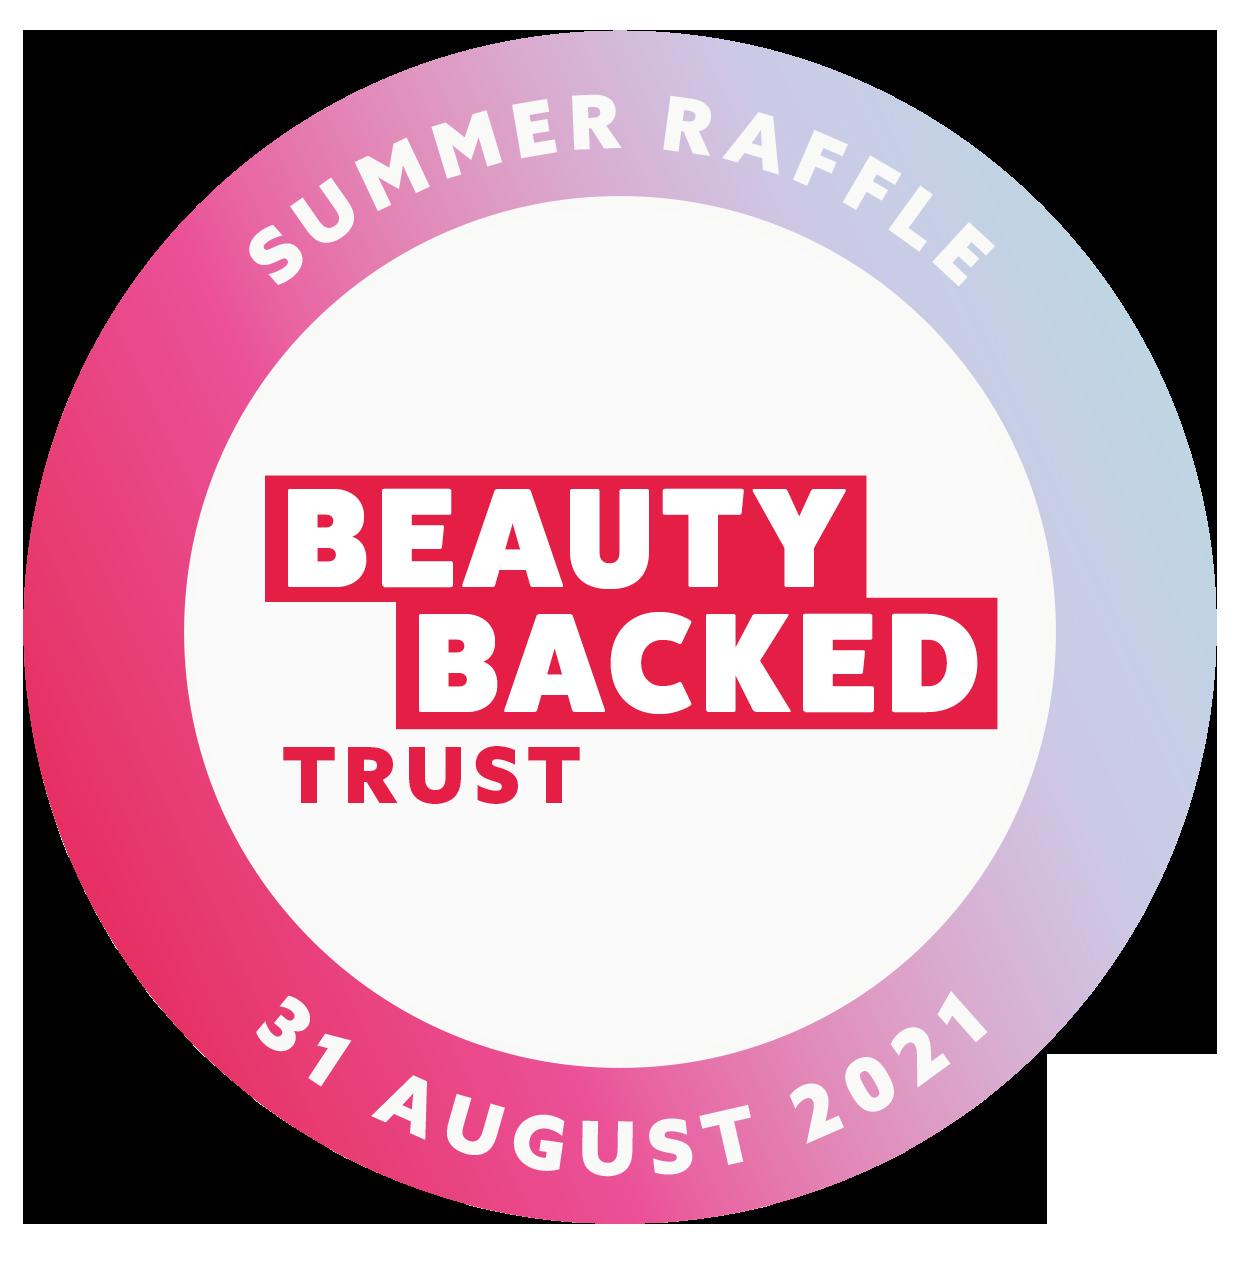 Beauty Backed Summer Raffle EXTENDED!